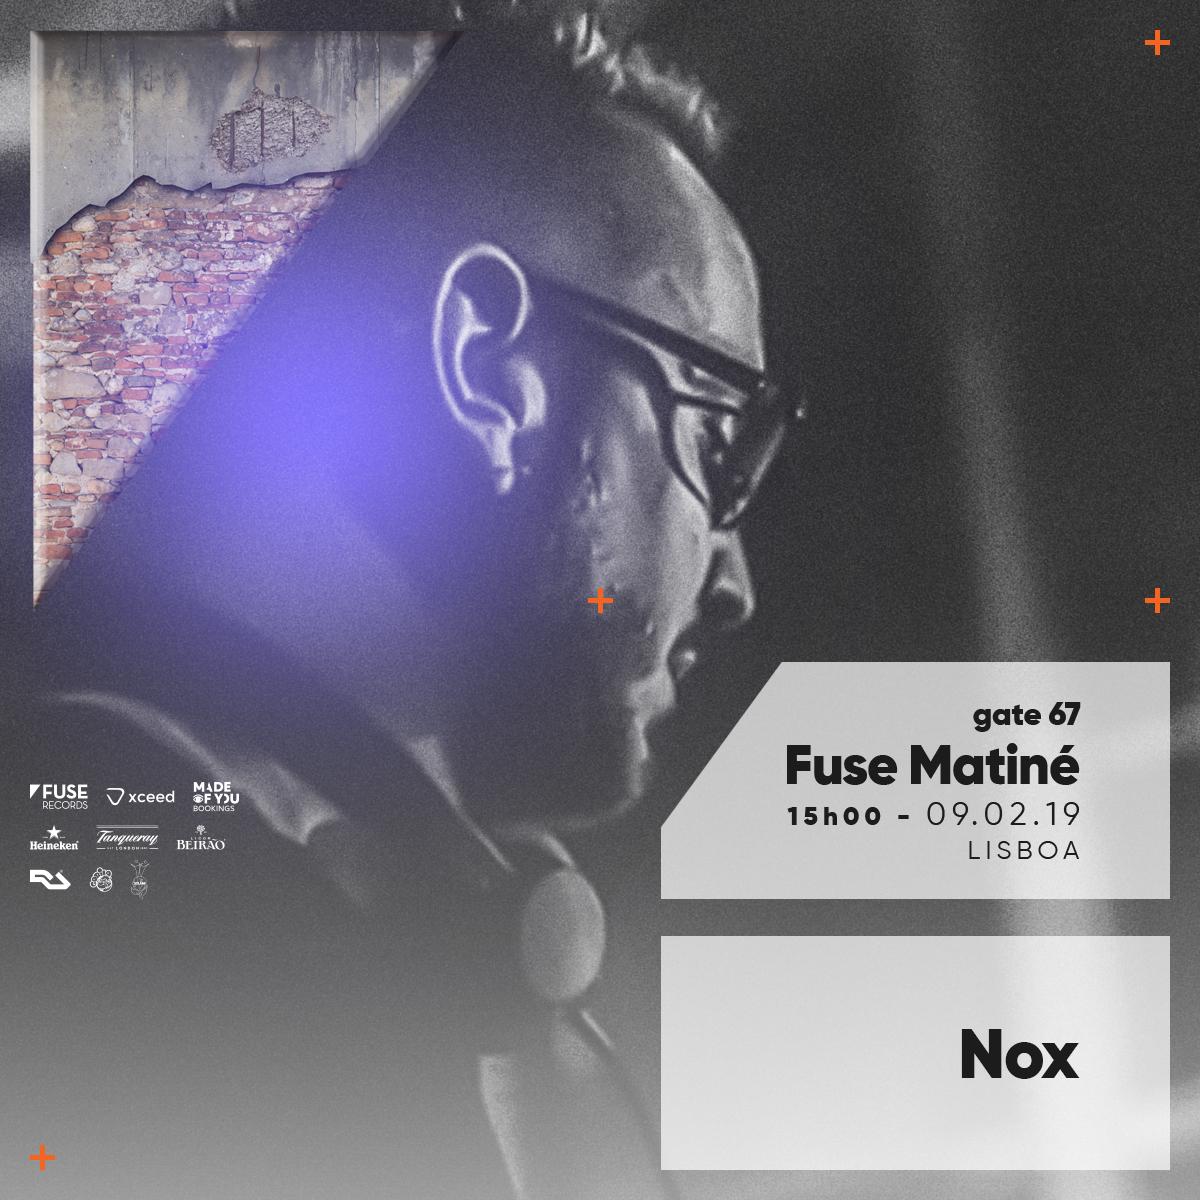 FuseMatine_090219_Profile_Nox.jpg